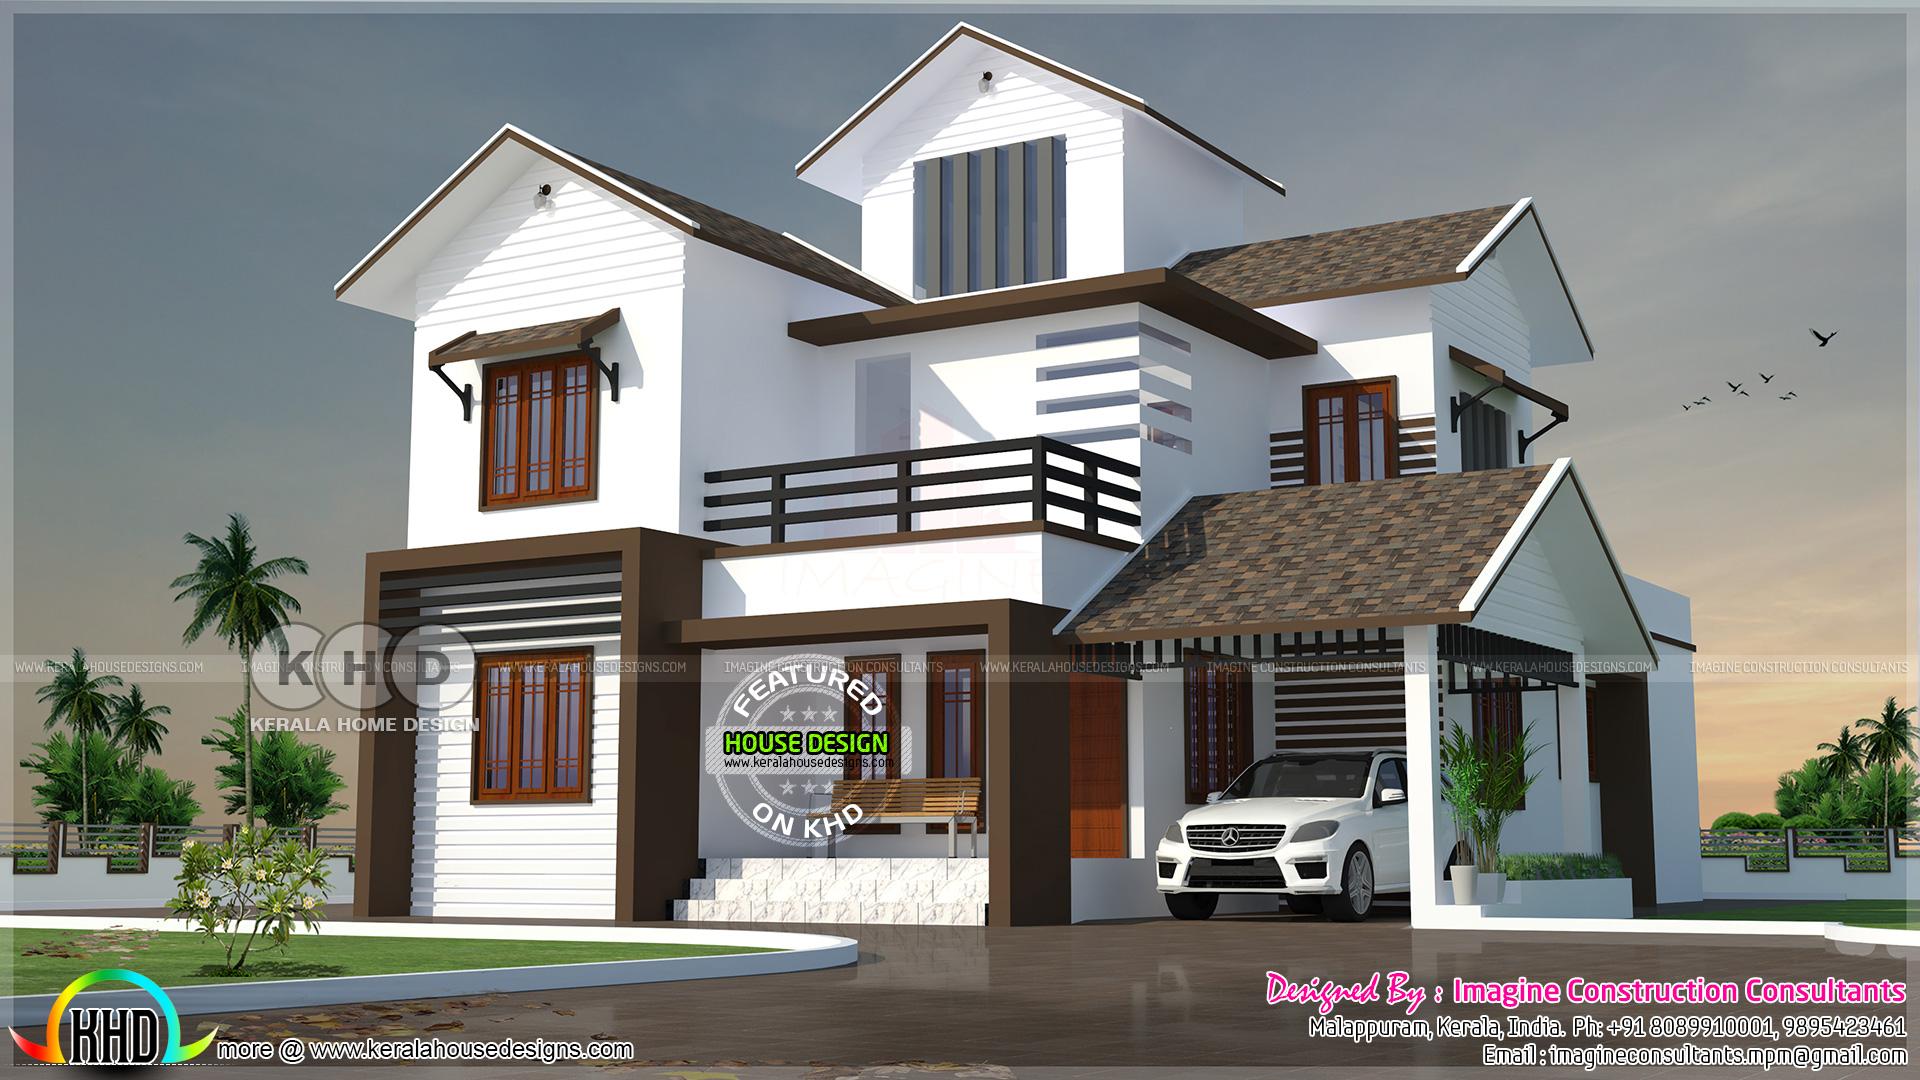 2328 Square Feet 4 Bedroom Sloped Roof Home Plan Kerala